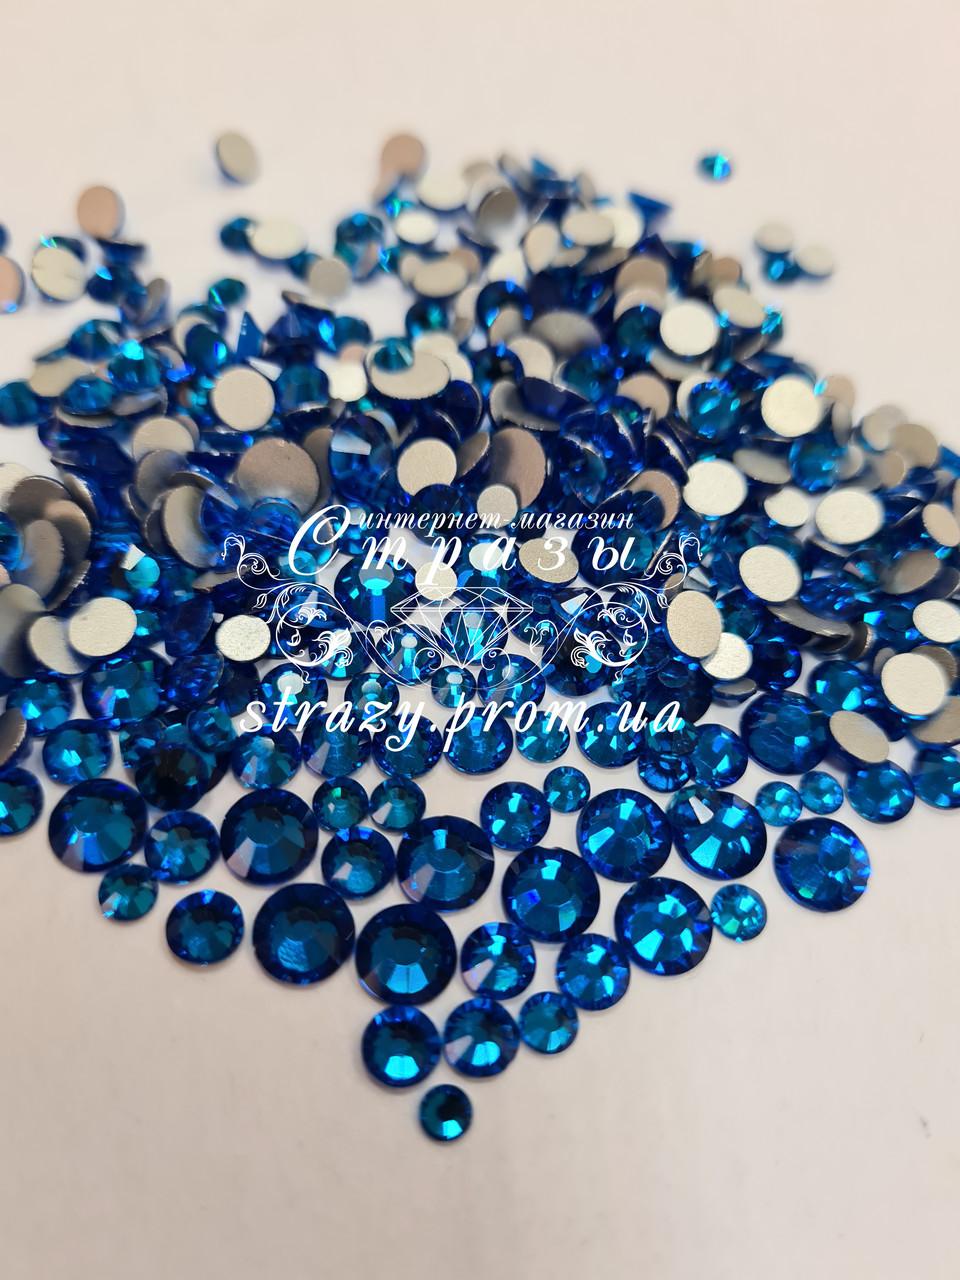 "Стразы Capri Blue Микс размеров 1400шт (ss12,ss16,ss20,ss30) ""Crystal Premium"""